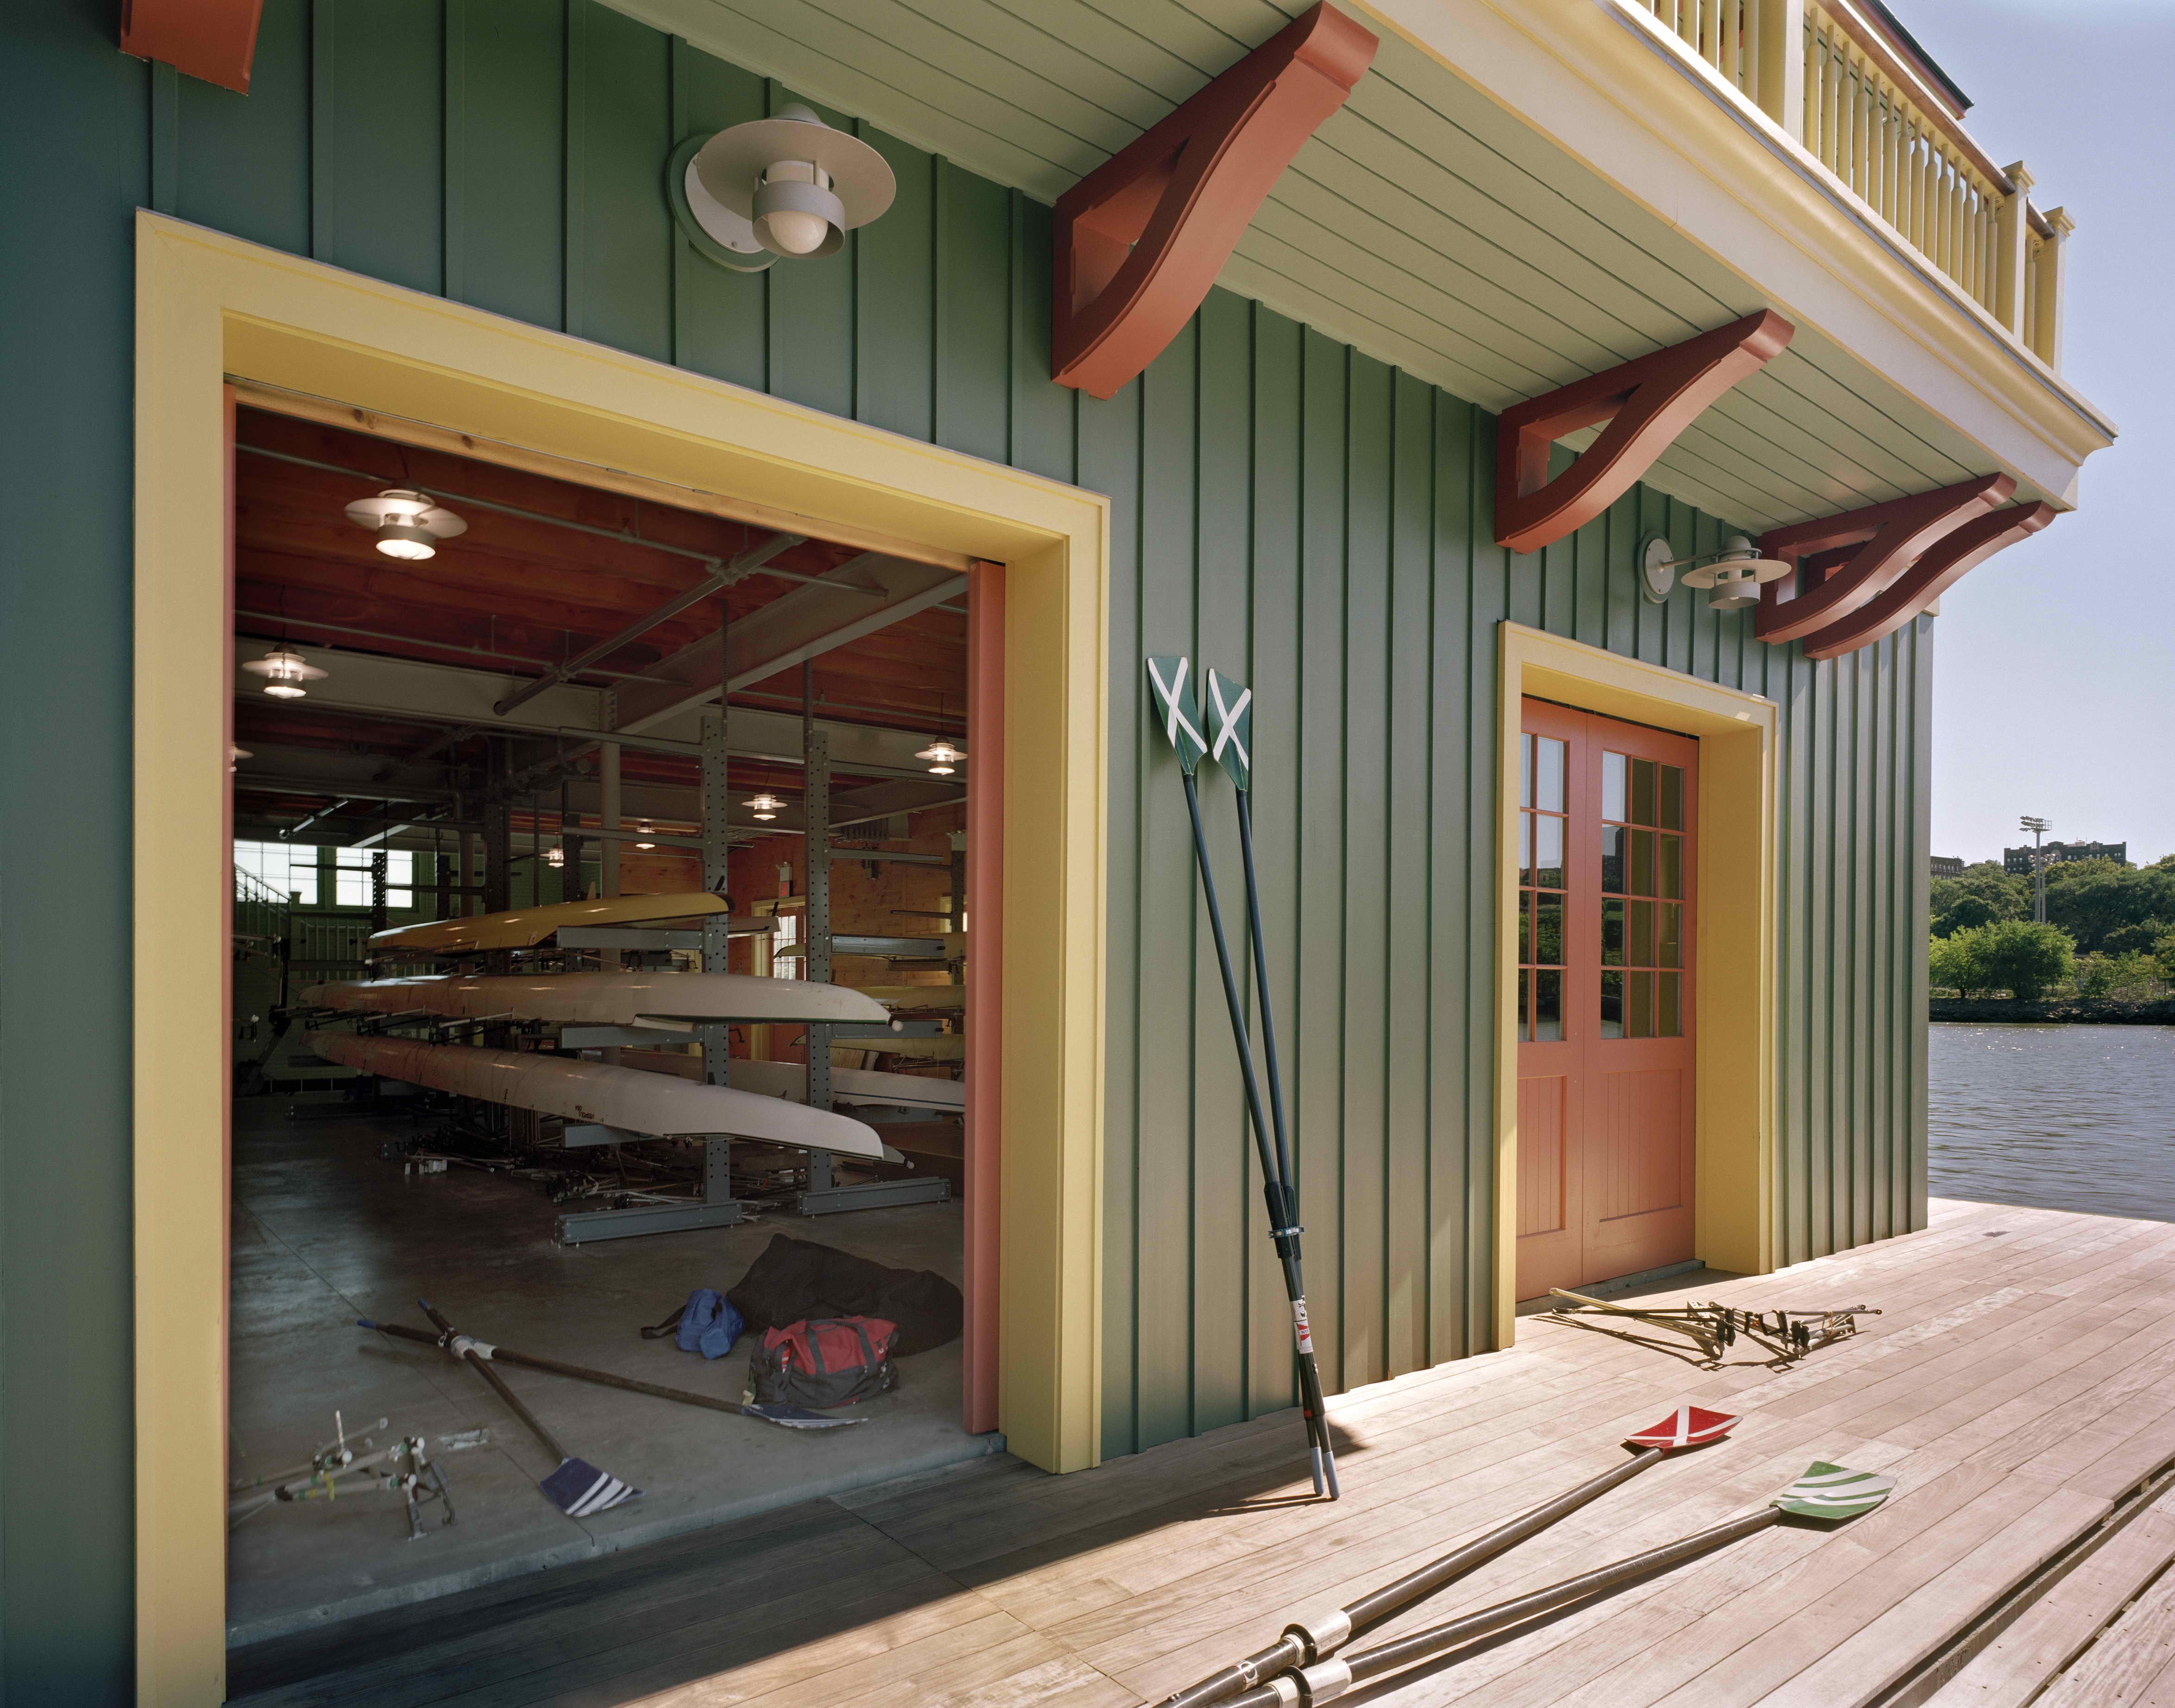 Peter Jay Sharp Boathouse — Robert A M  Stern Architects, LLP